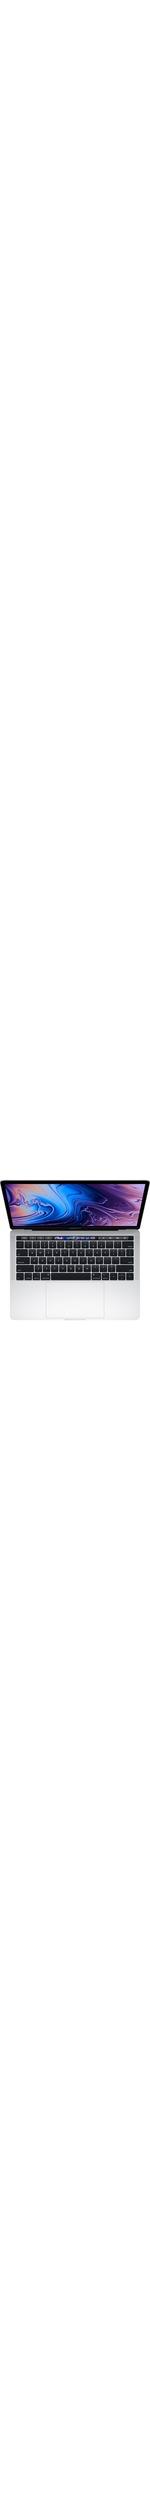 Apple MacBook Pro MV992B/A 33.8 cm 13.3And#34; Notebook - 2560 x 1600 - Core i5 - 8 GB RAM - 256 GB SSD - Silver